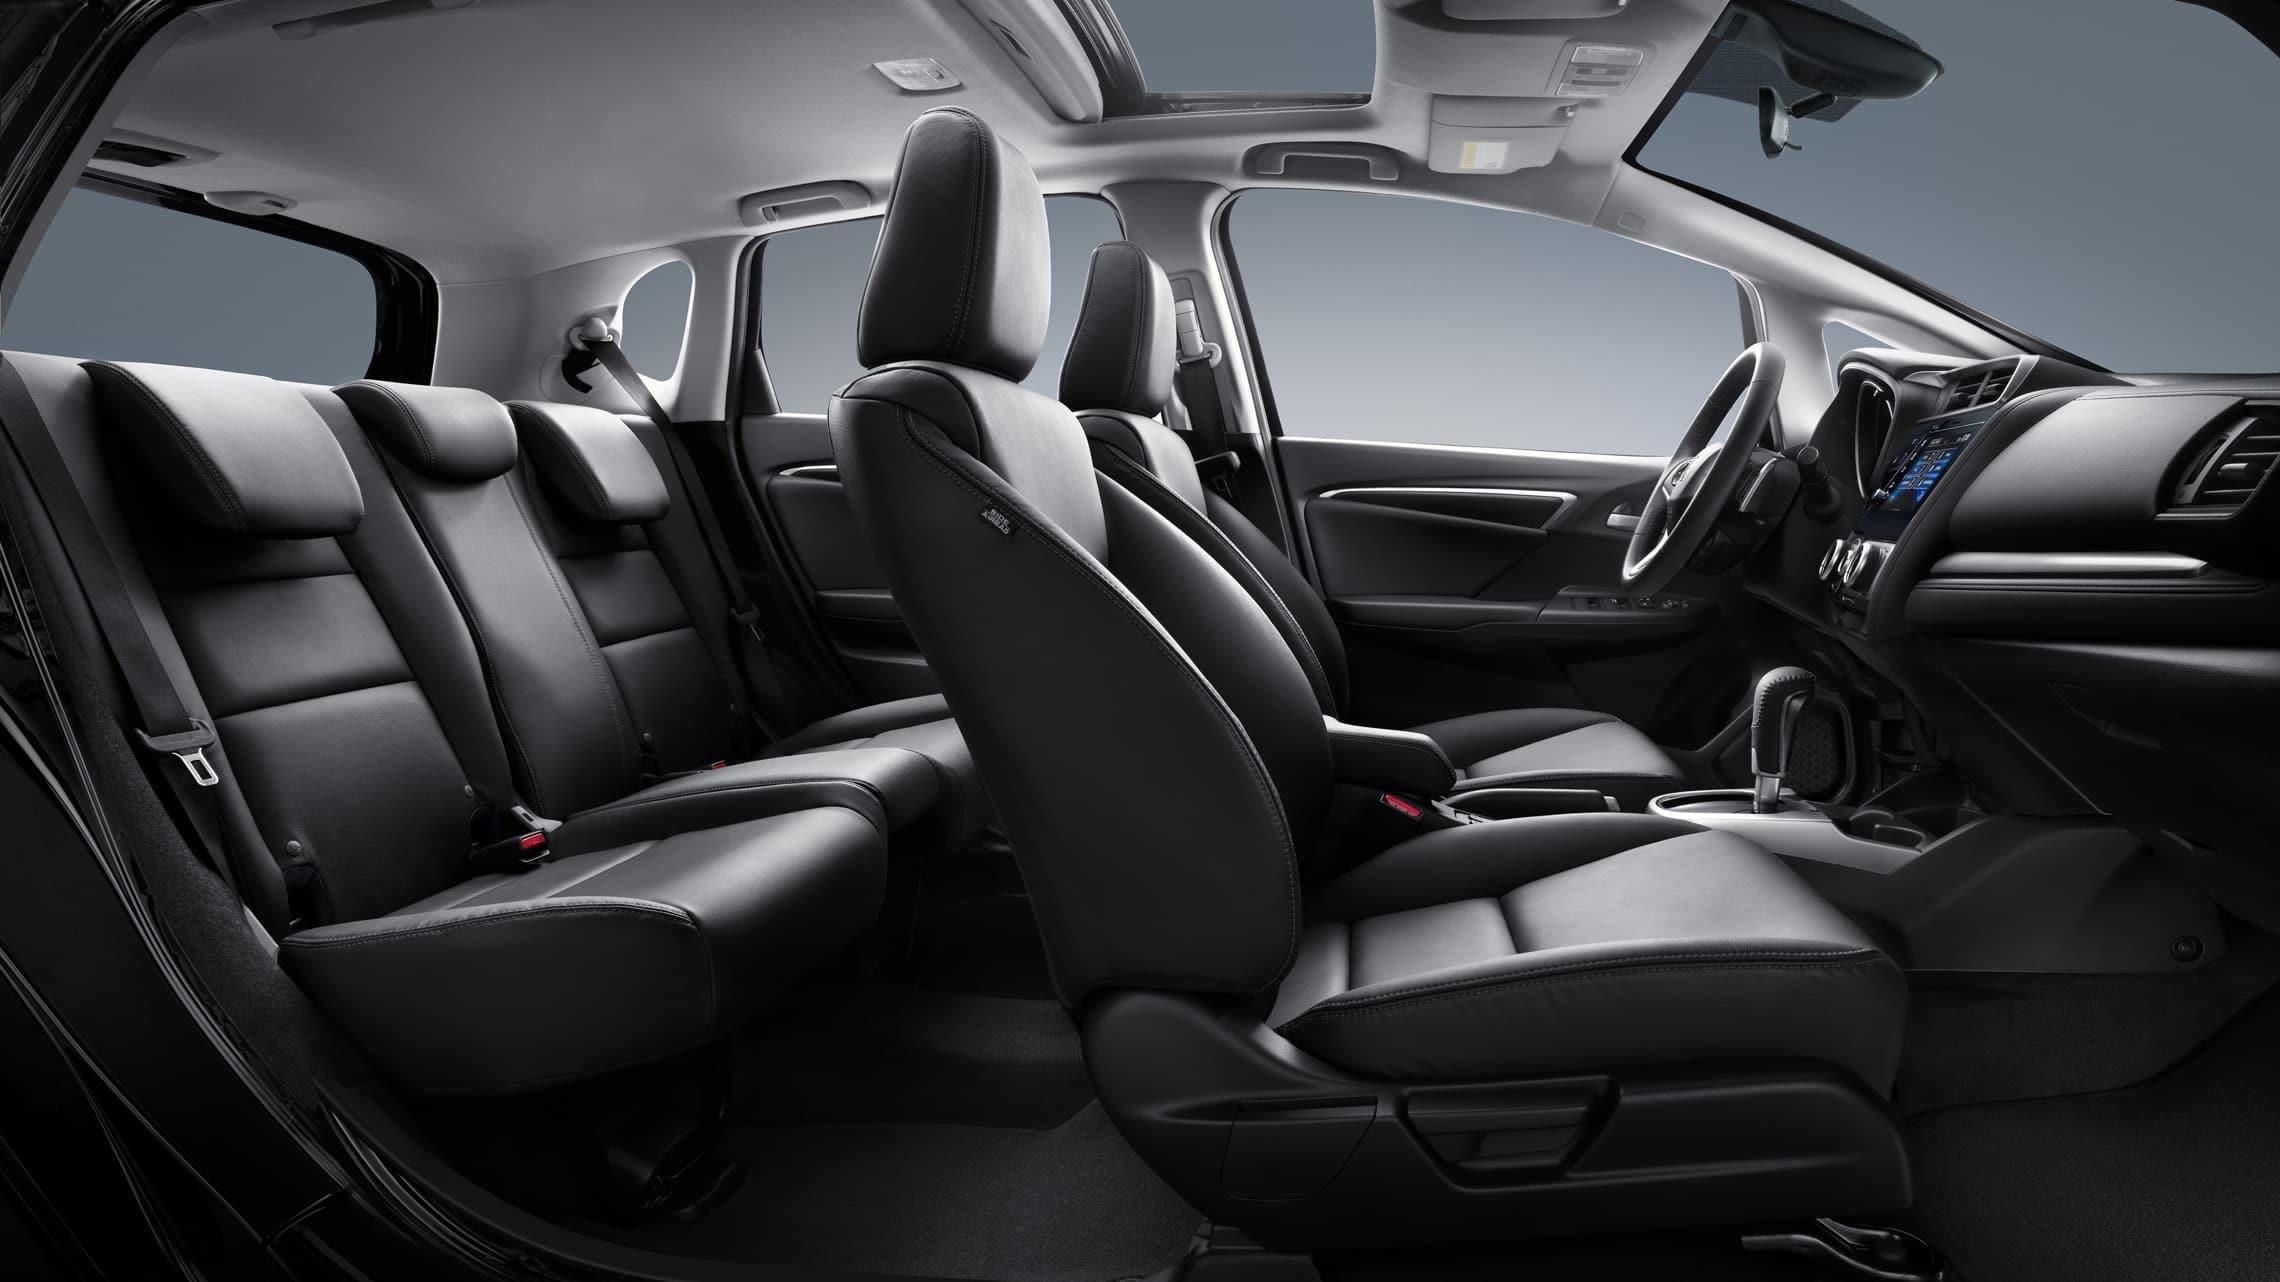 Vista de perfil desde el lado del pasajero del interior del HondaFitEX-L2020 con Black Leather.